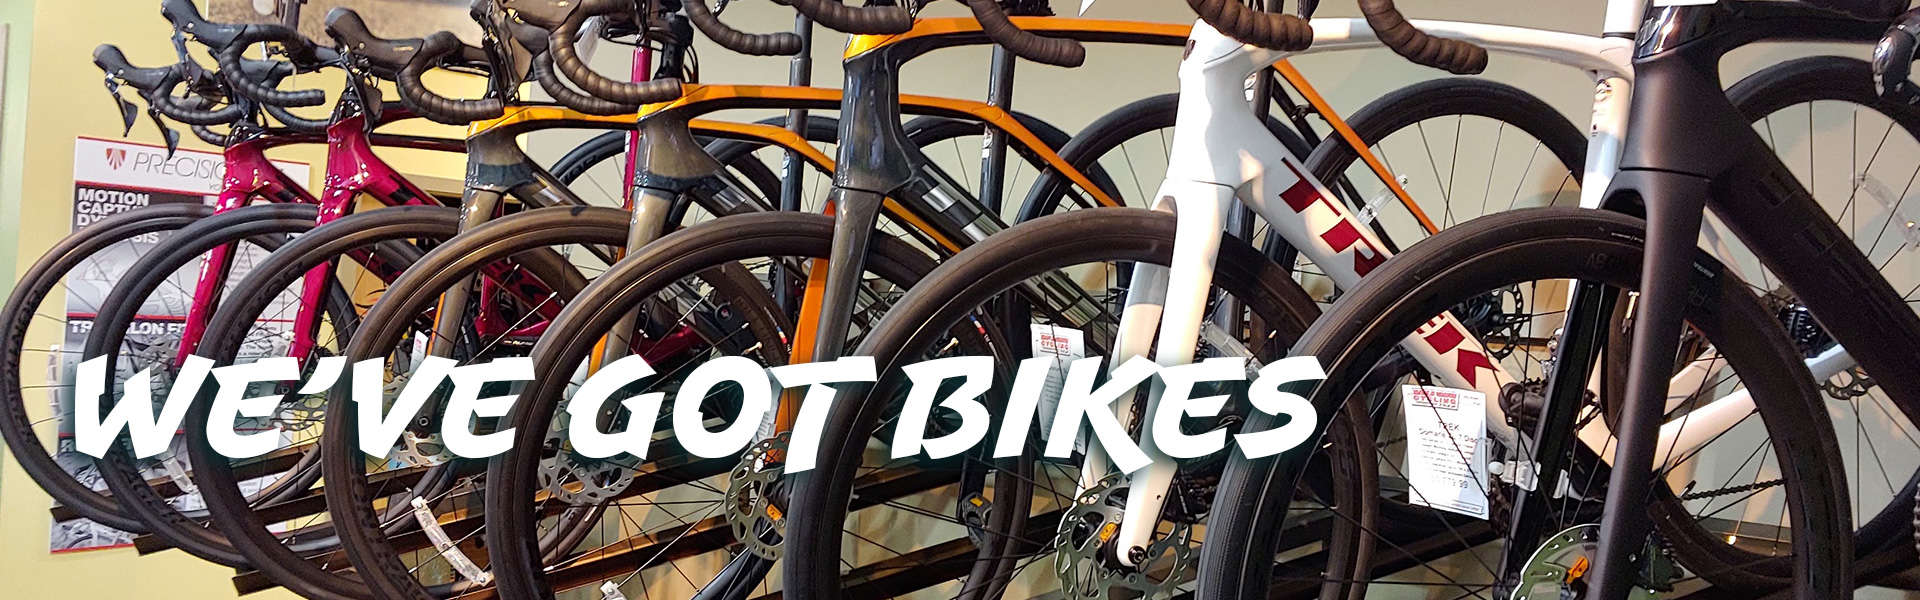 We've Got Road Bikes